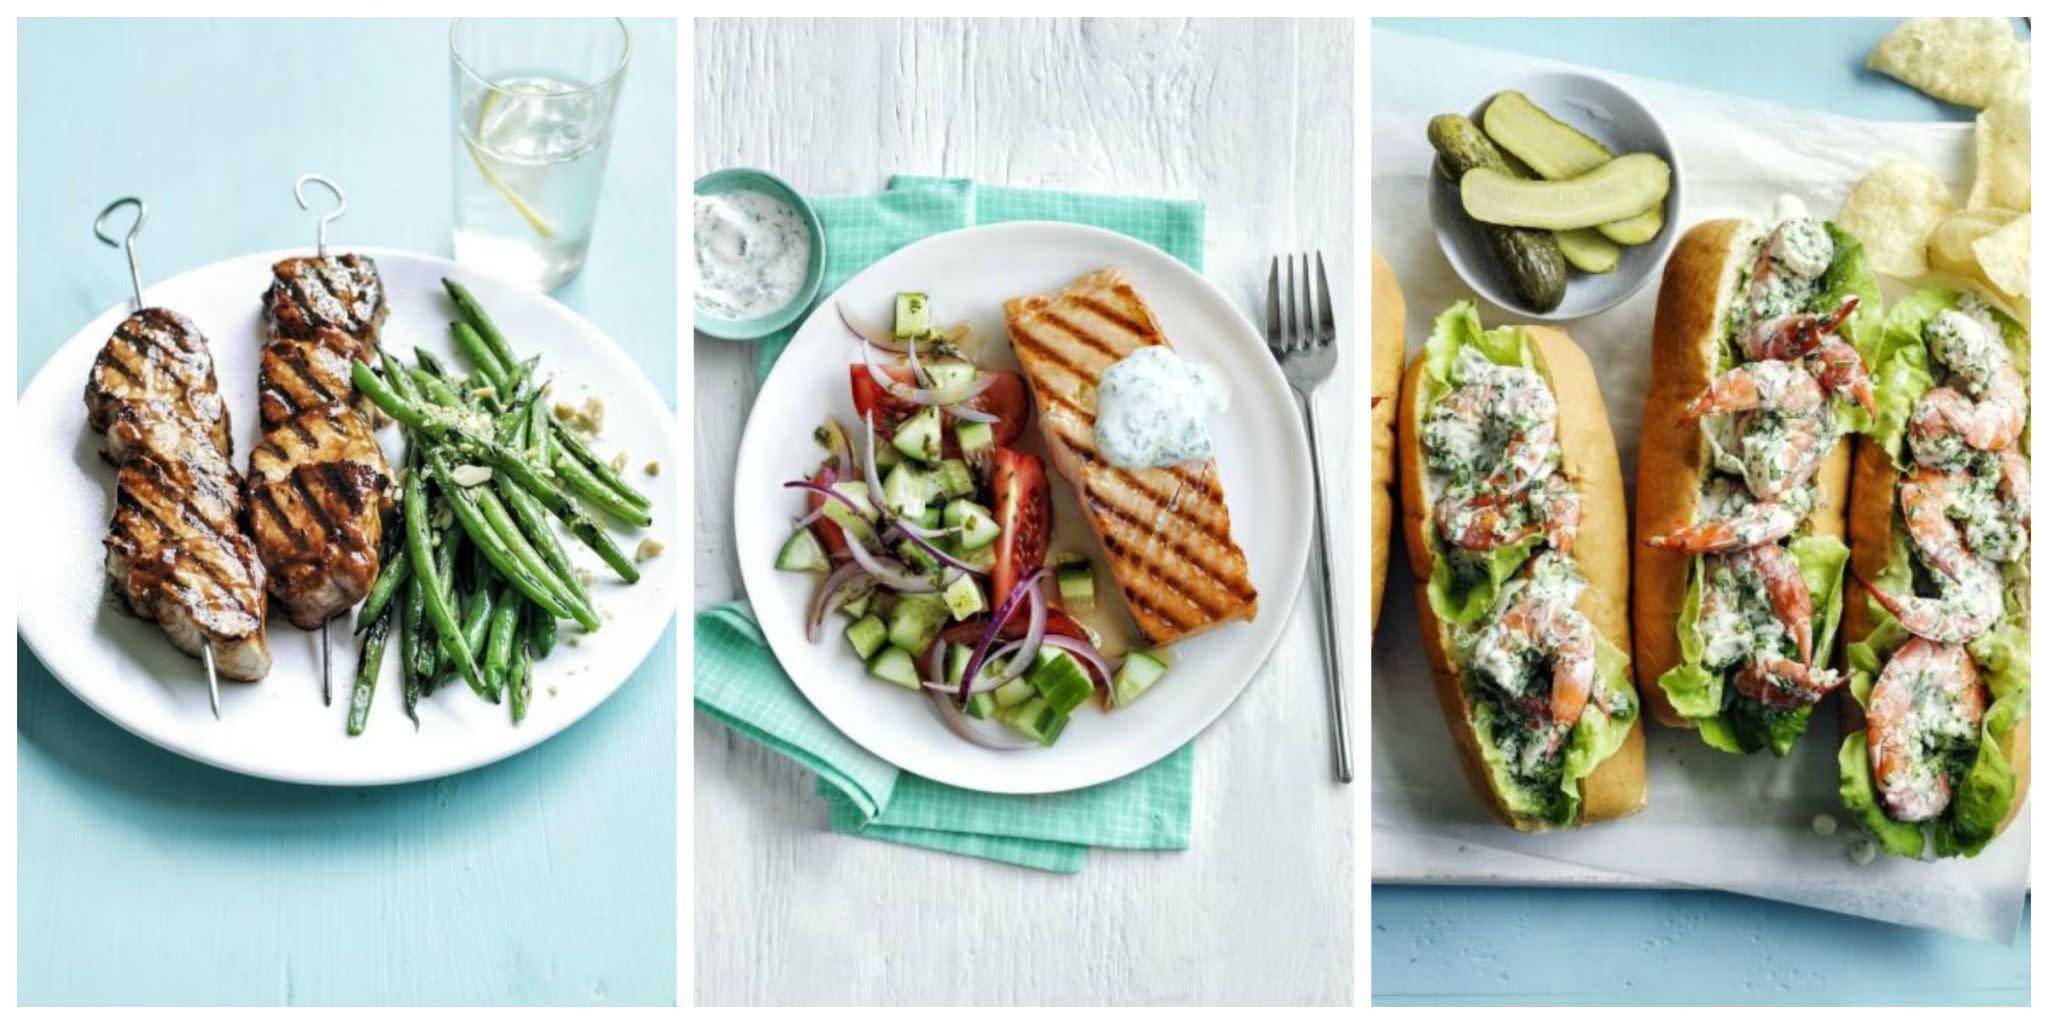 24 healthy dinner ideas under 400 calories